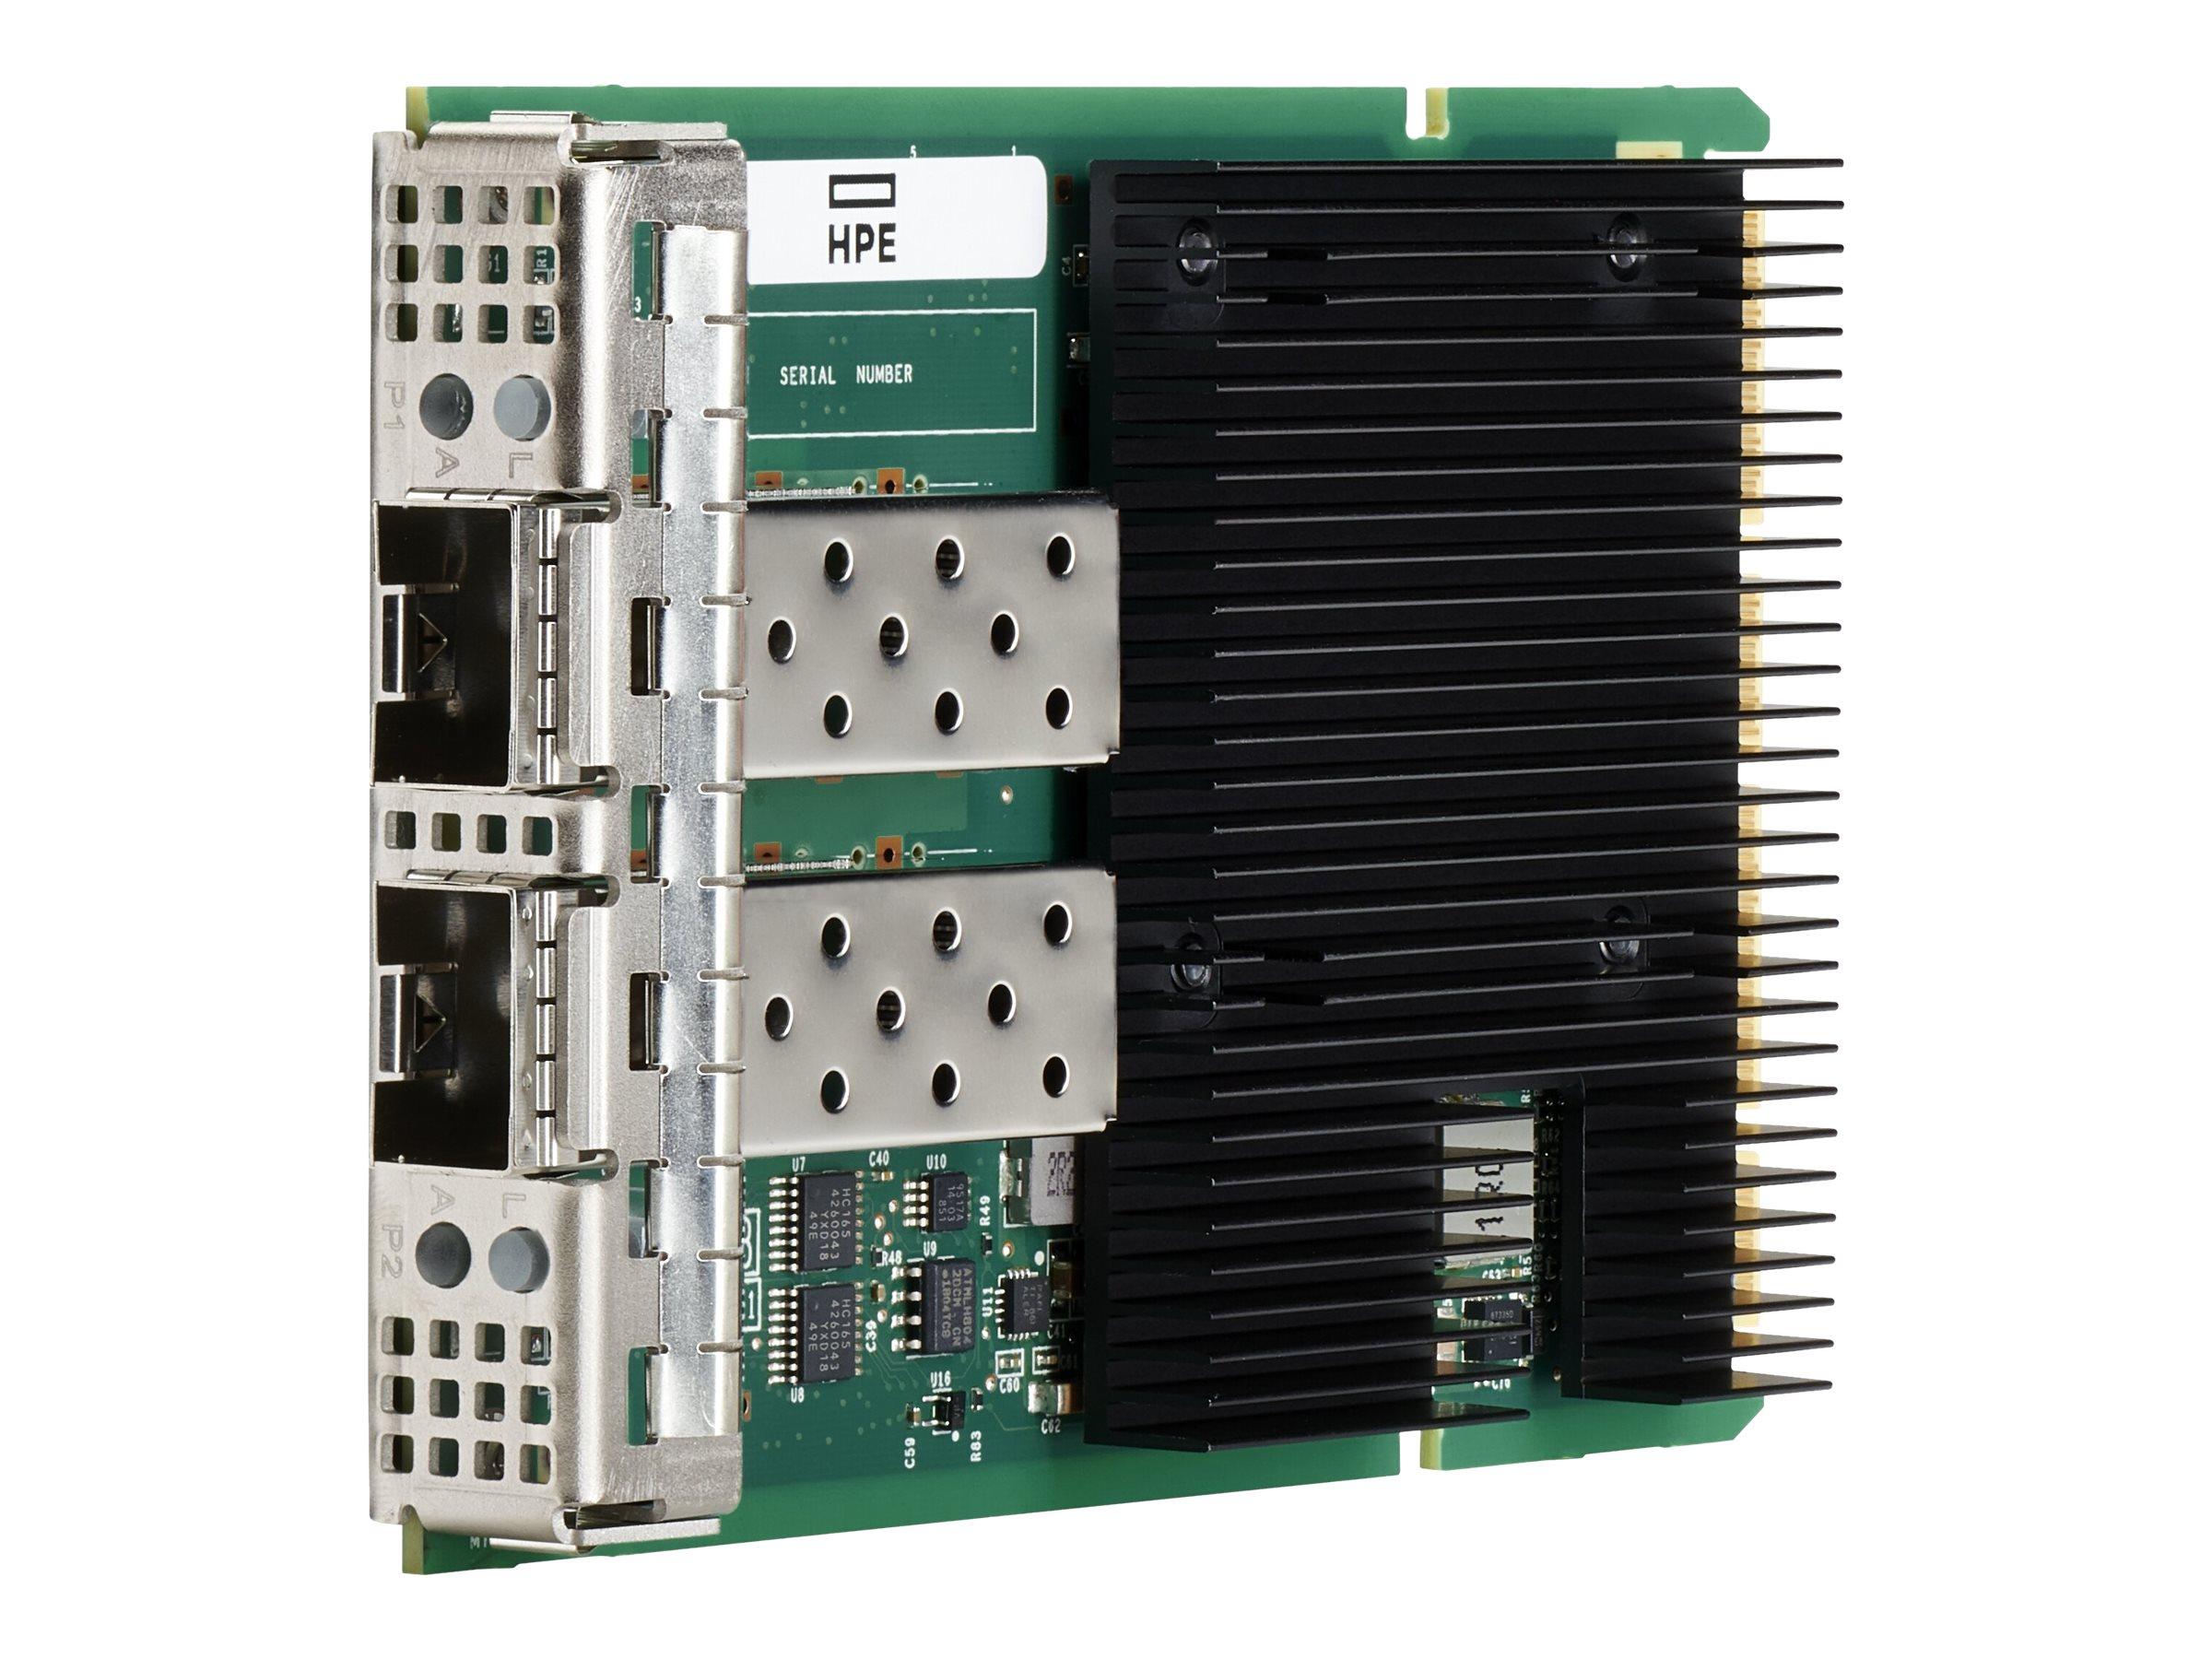 Broadcom BCM57414 - network adapter - OCP 3.0 - Gigabit Ethernet / 10Gb Ethernet / 25Gb Ethernet SFP28 x 2